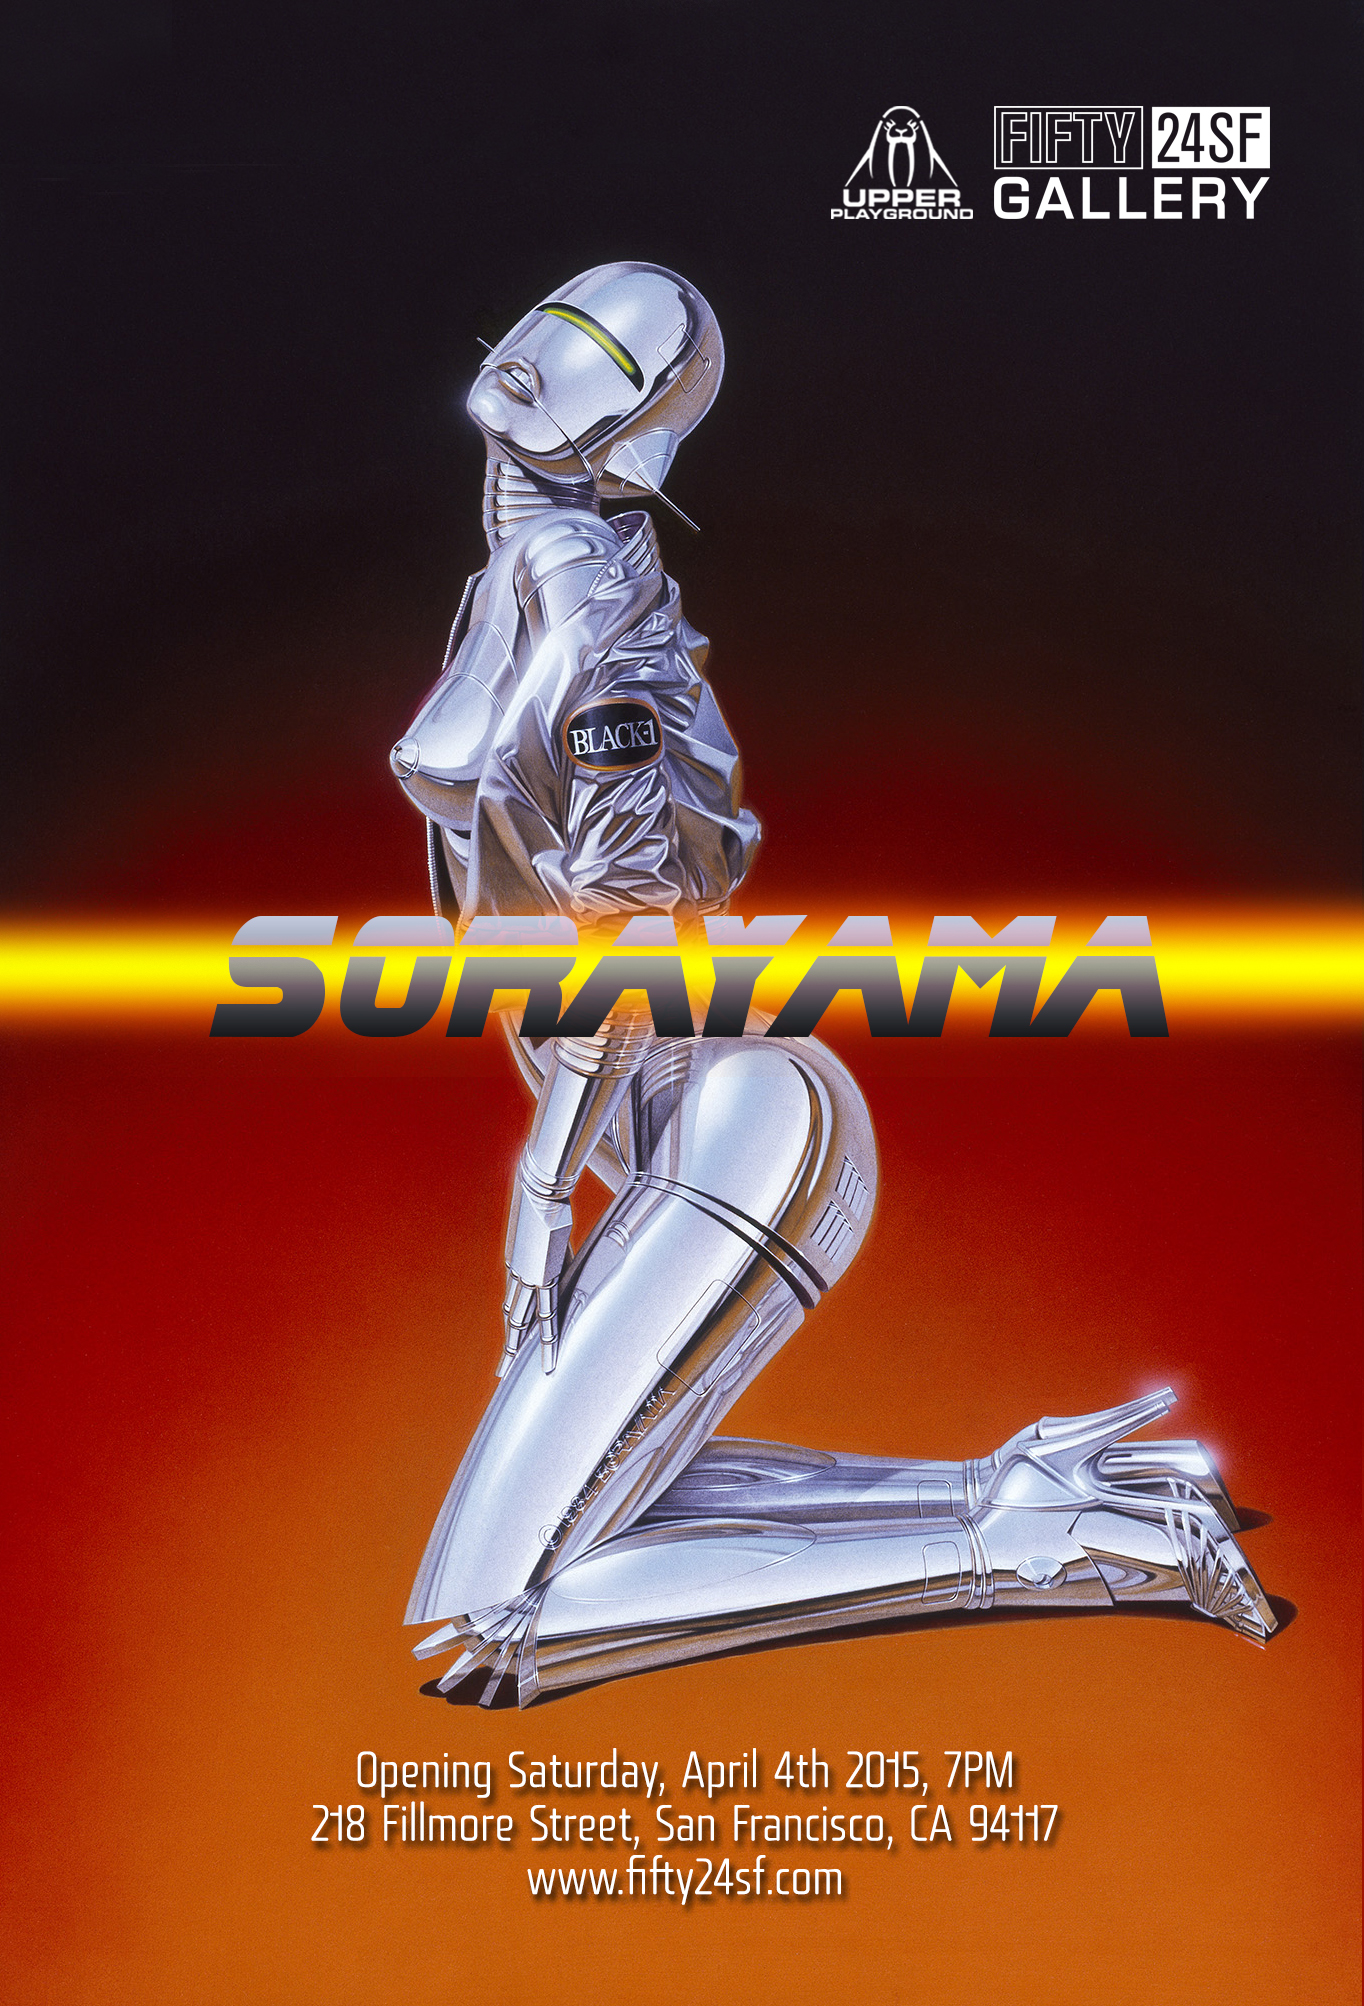 Sorayama-Fifty24SF-San-Francisco.jpg